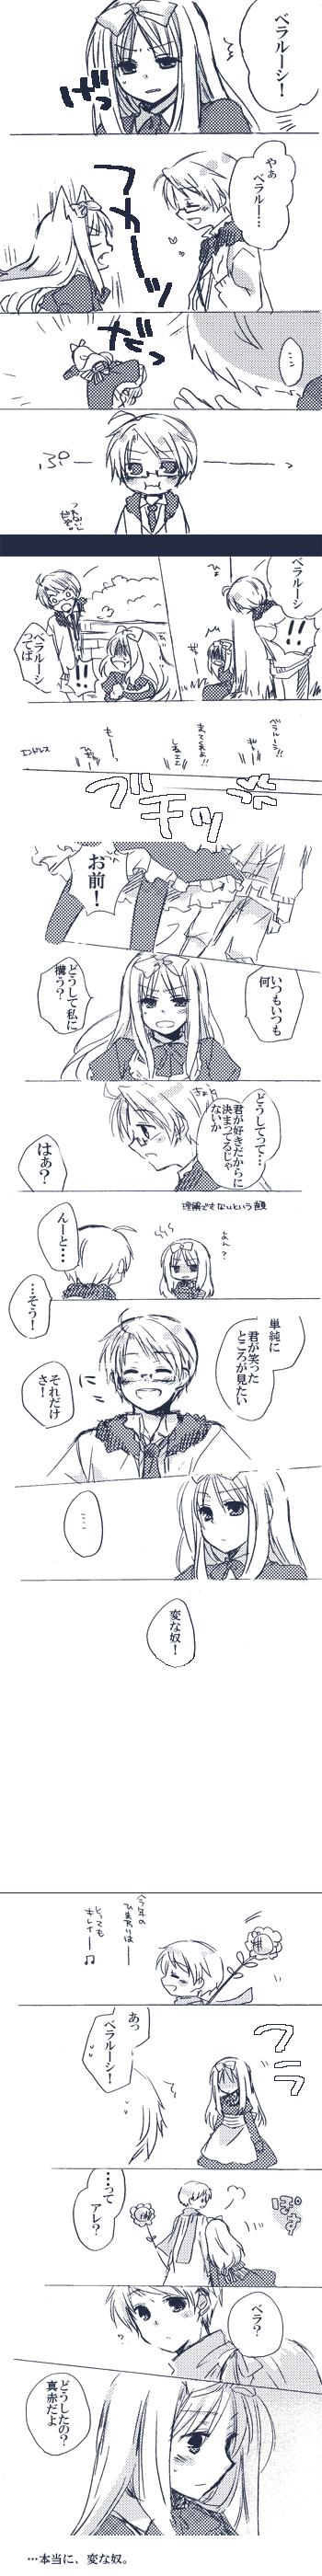 Tags: Anime, Love-moon, Axis Powers: Hetalia, Russia, Belarus, United States, Comic